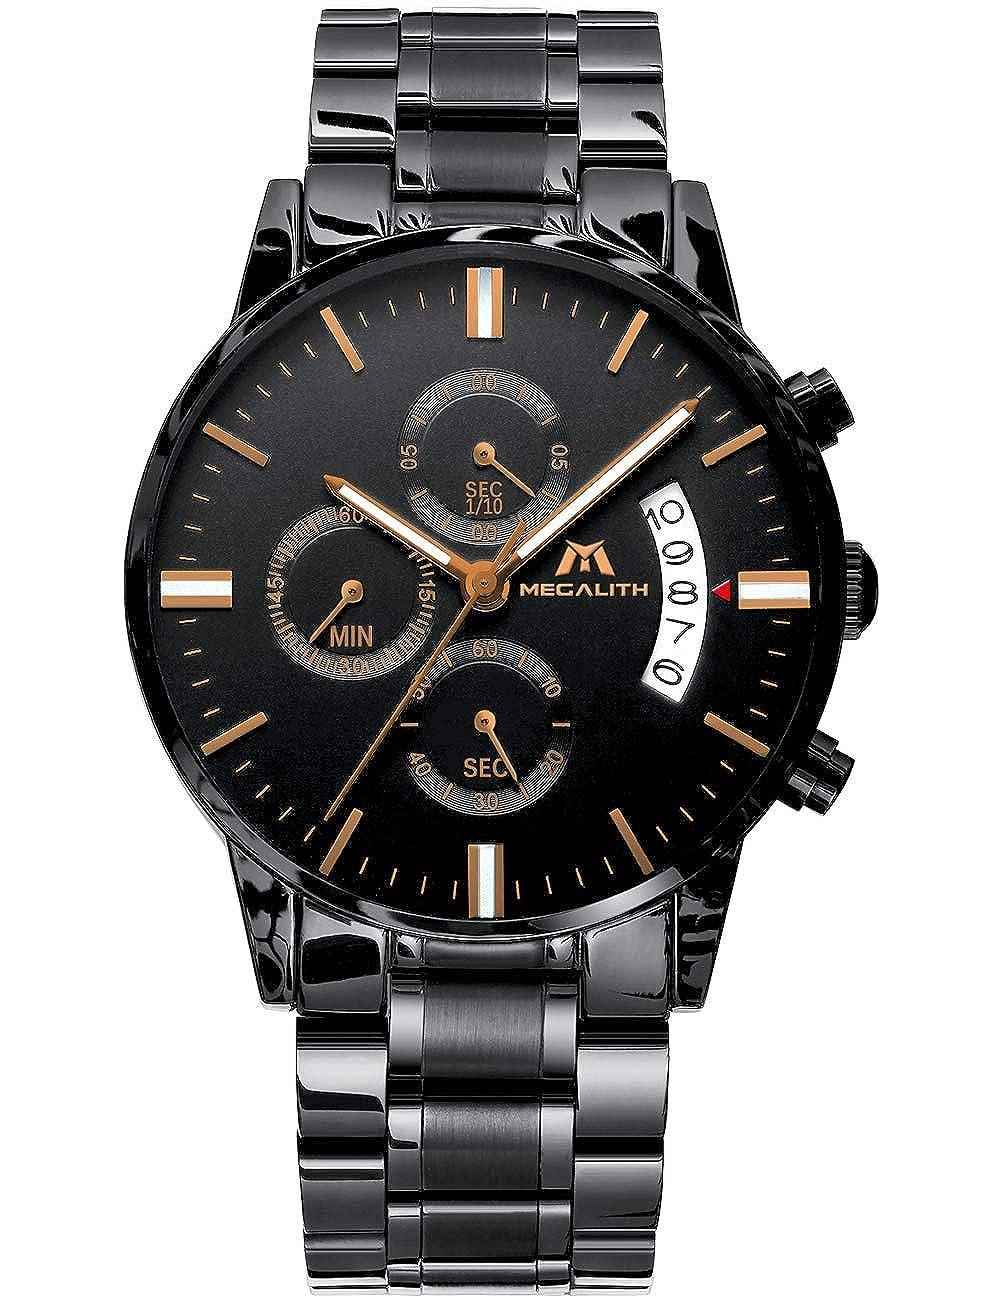 Relojes de Hombre Reloje Grandes de Pulsera MilitaryCronógrafo Impermeable Negro Acero Inoxidable Reloj para Hombres Calendario Lujo Diseño Analógico